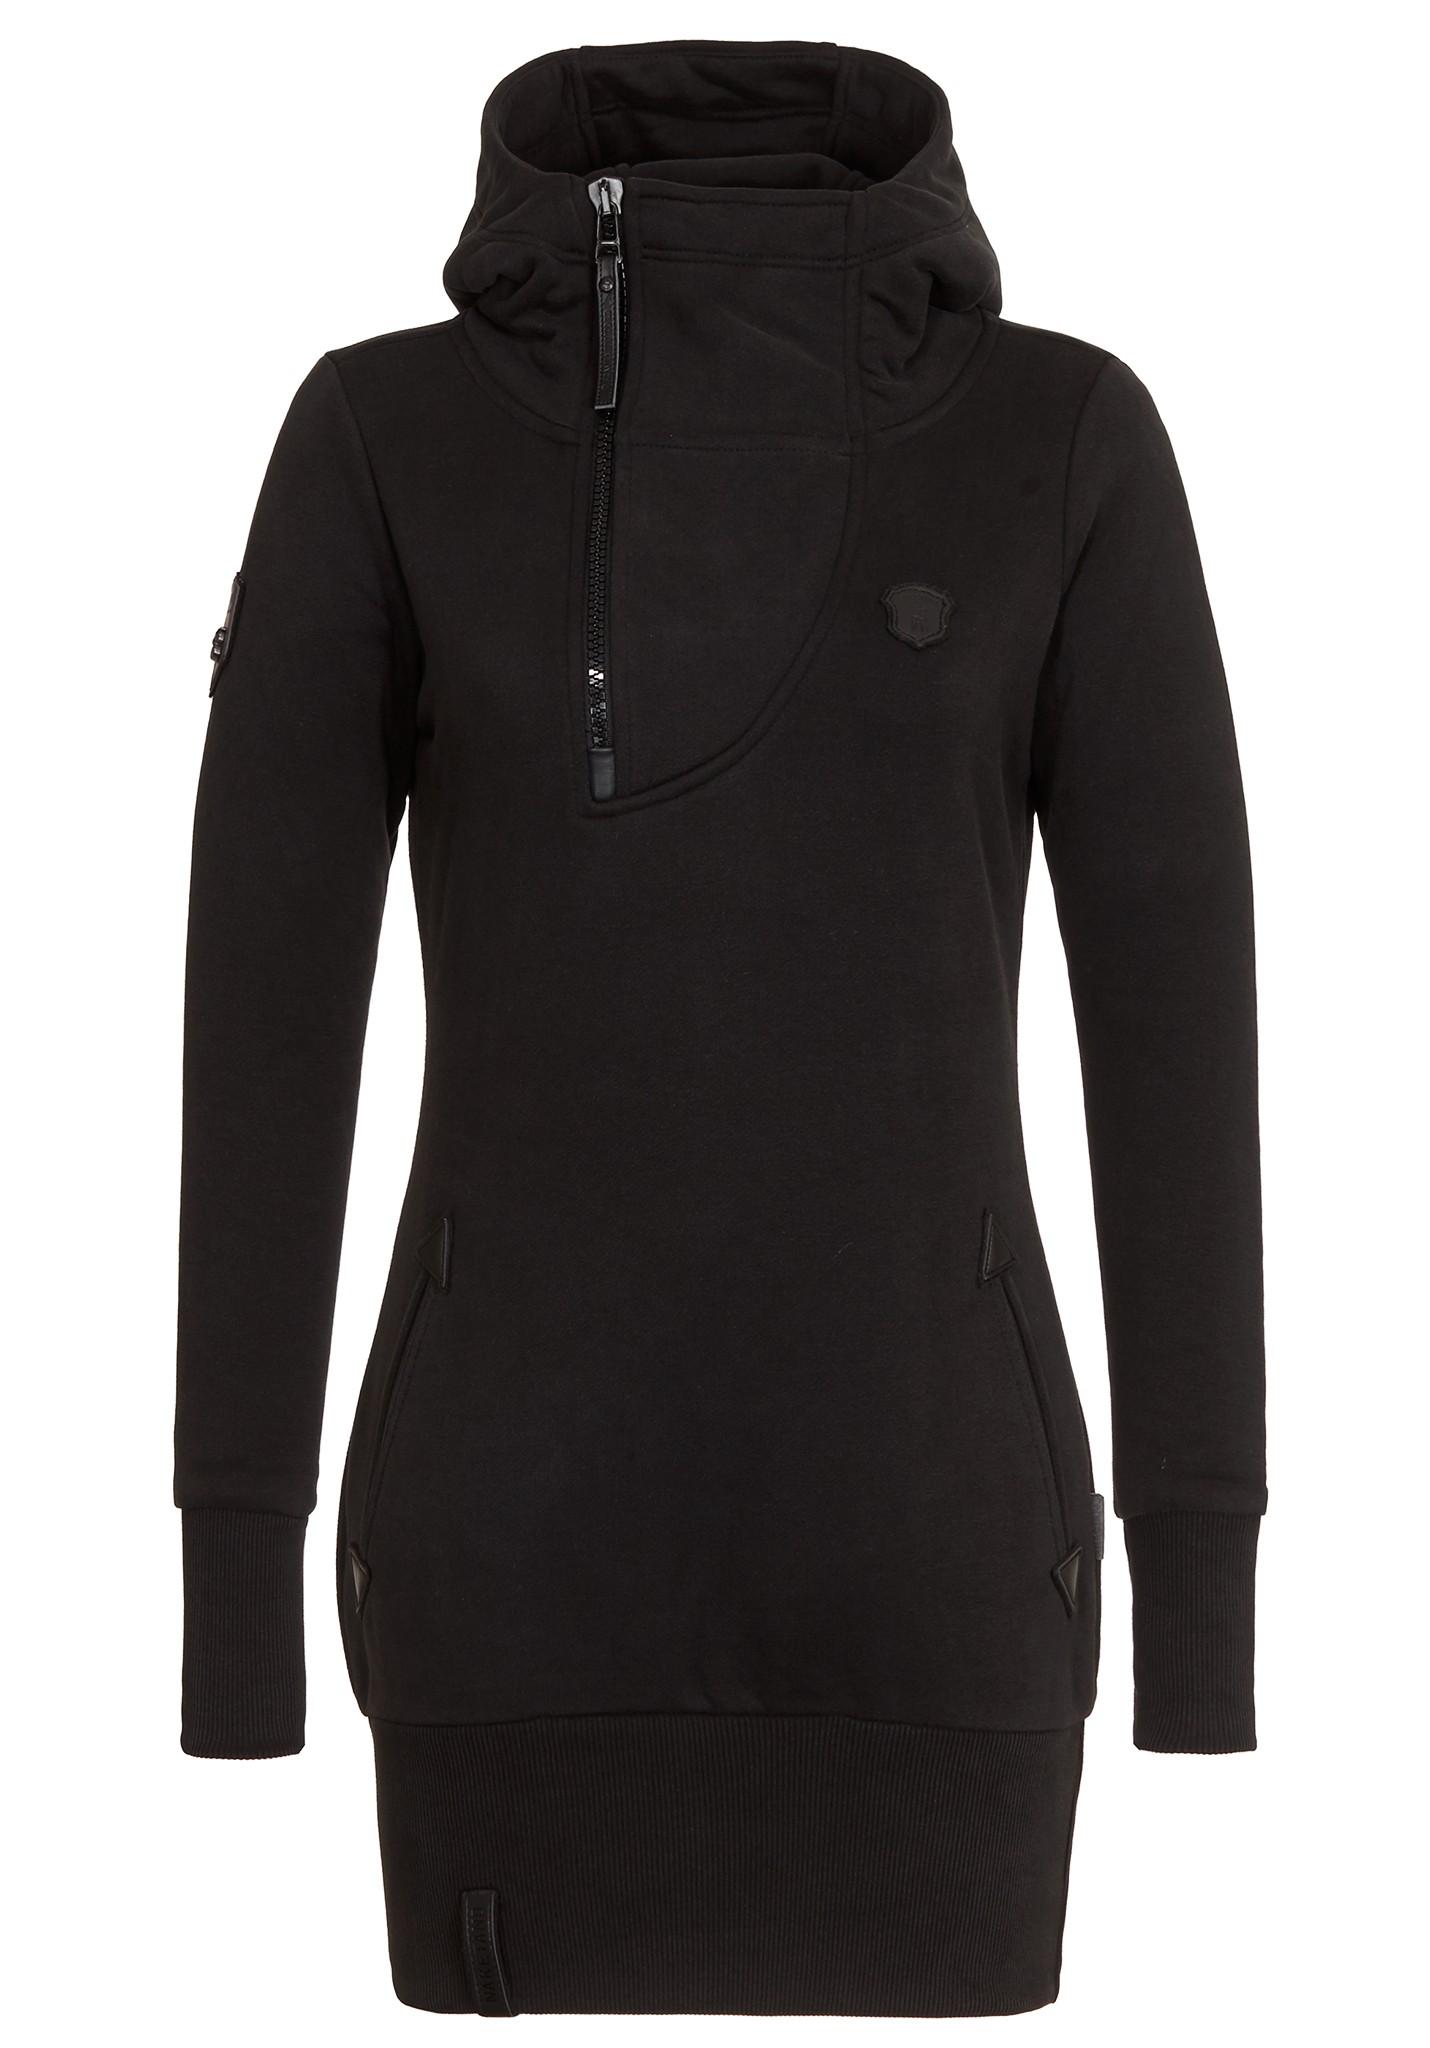 neu naketano ankerbraut damen kapuzenpullover pullover hoodie kapuzenjacke ebay. Black Bedroom Furniture Sets. Home Design Ideas